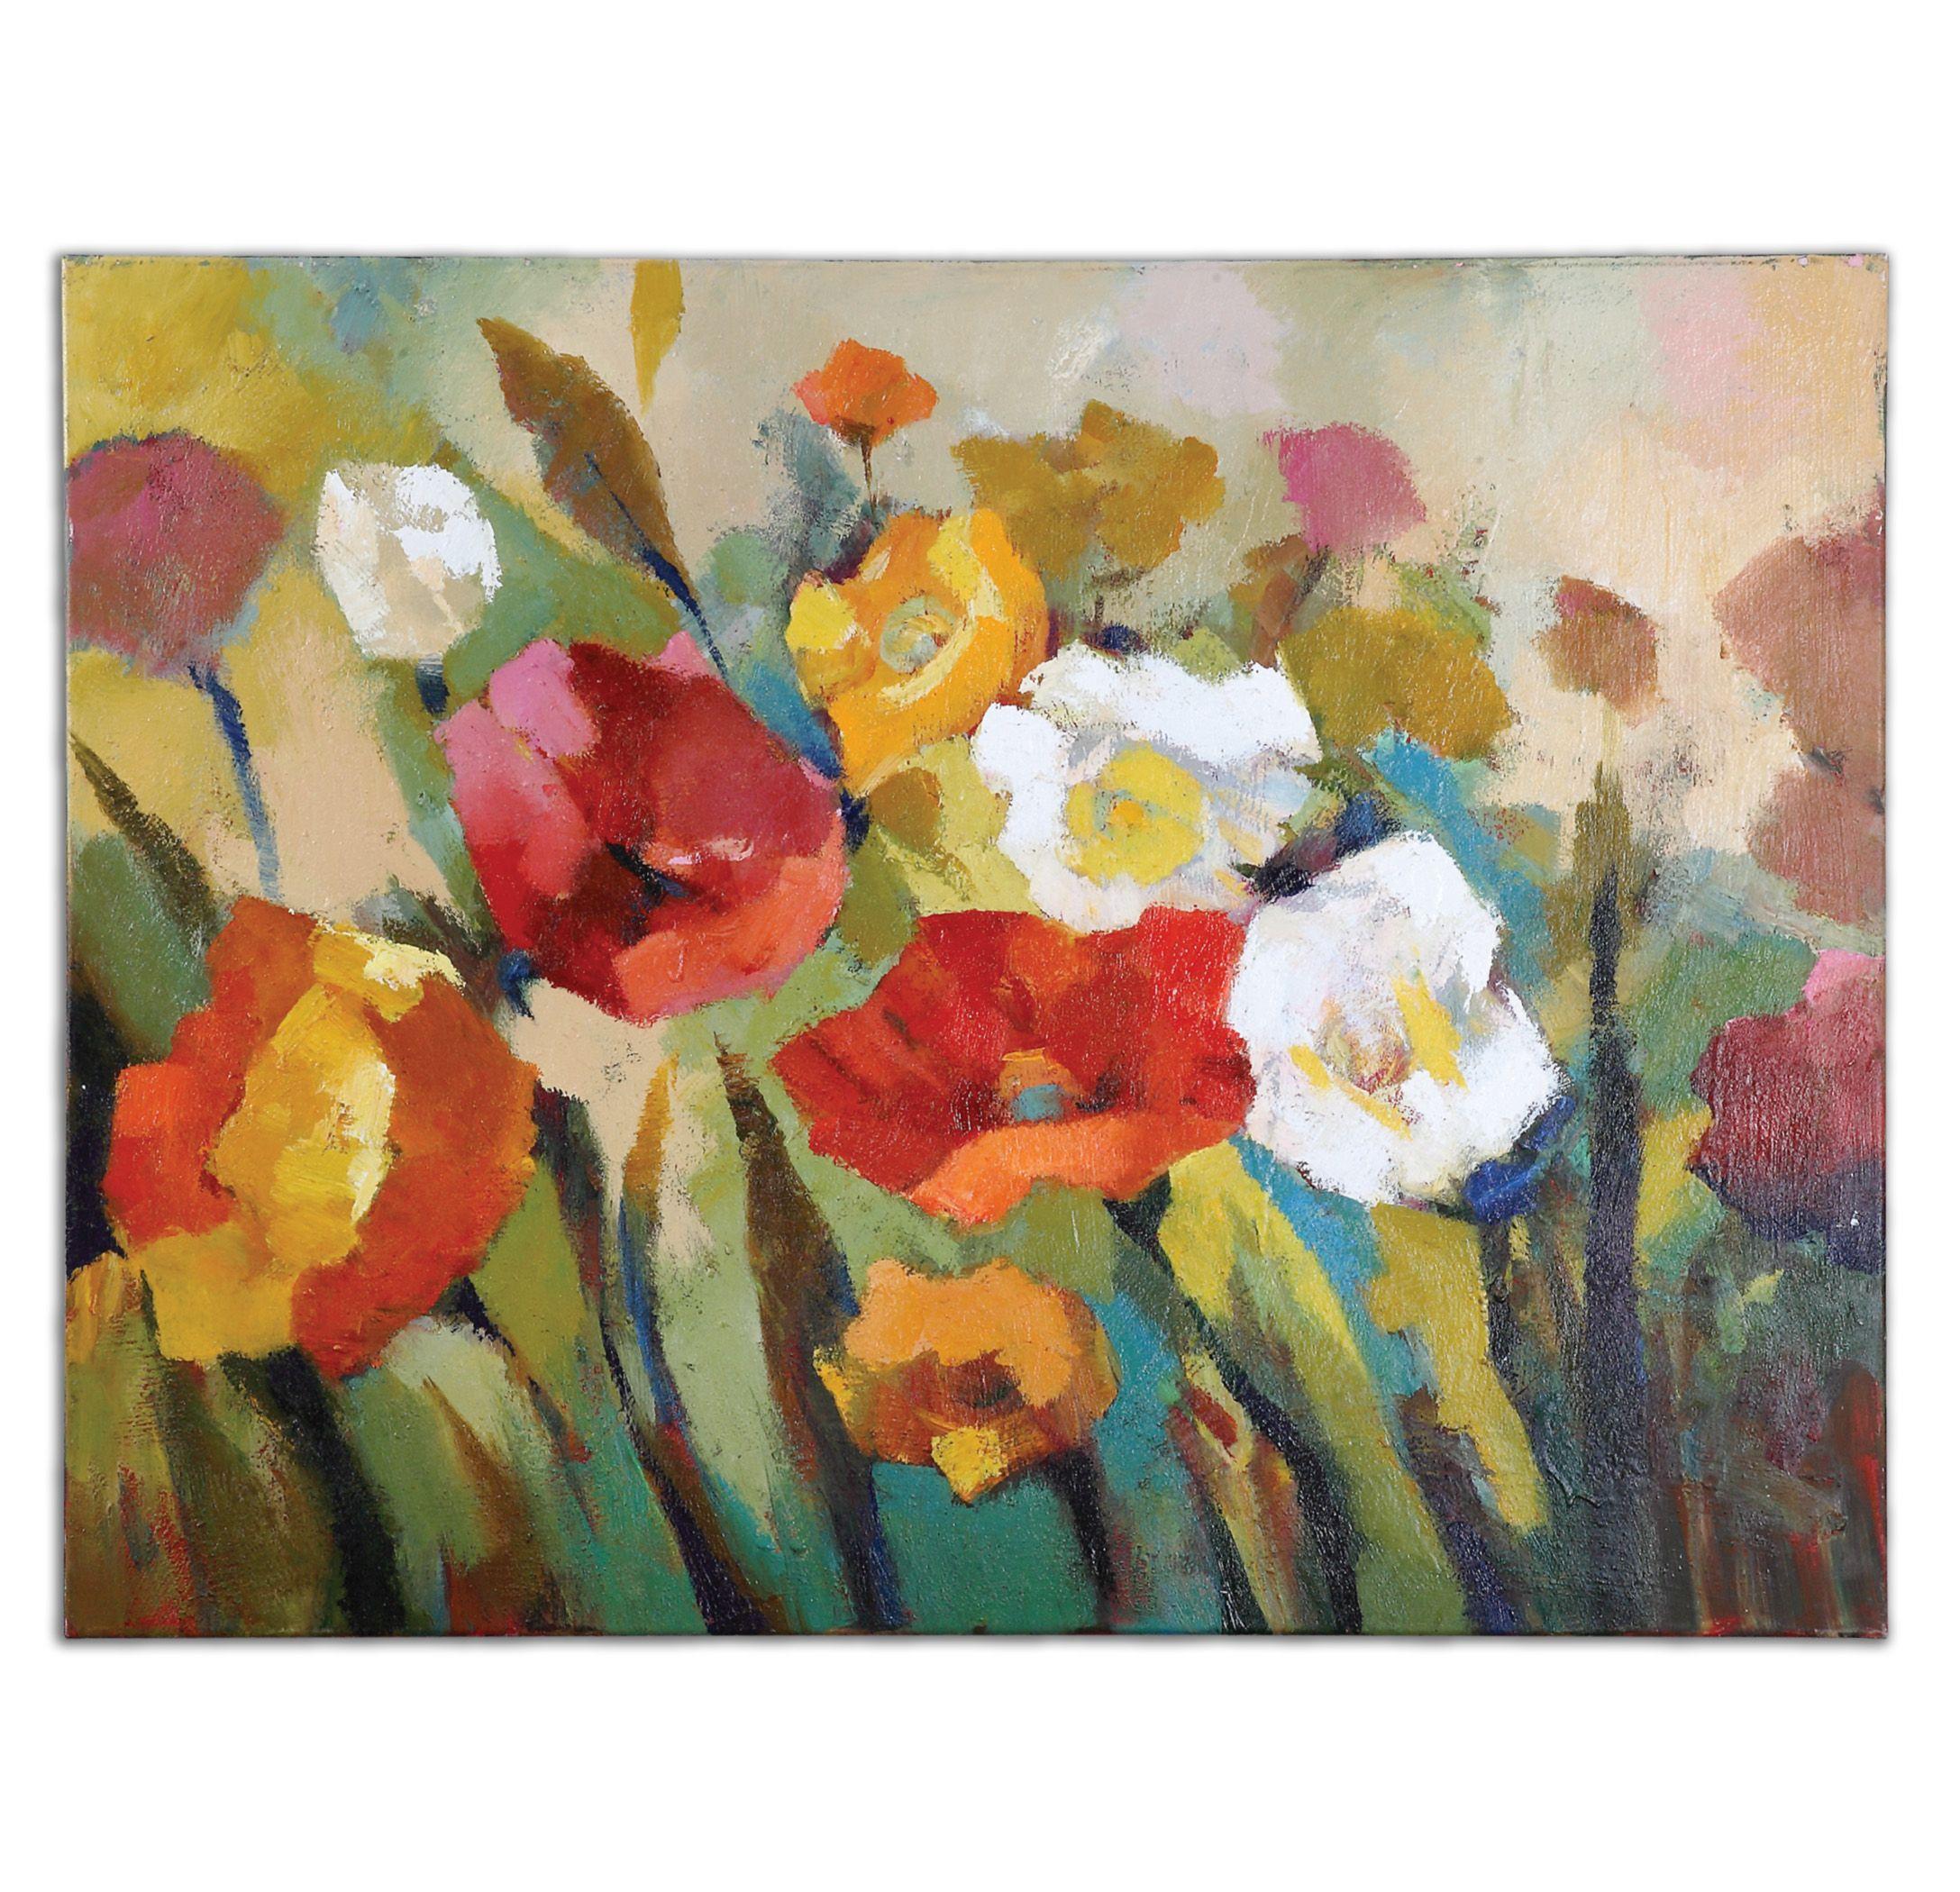 Uttermost 34268 Spring Has Sprung Floral Art